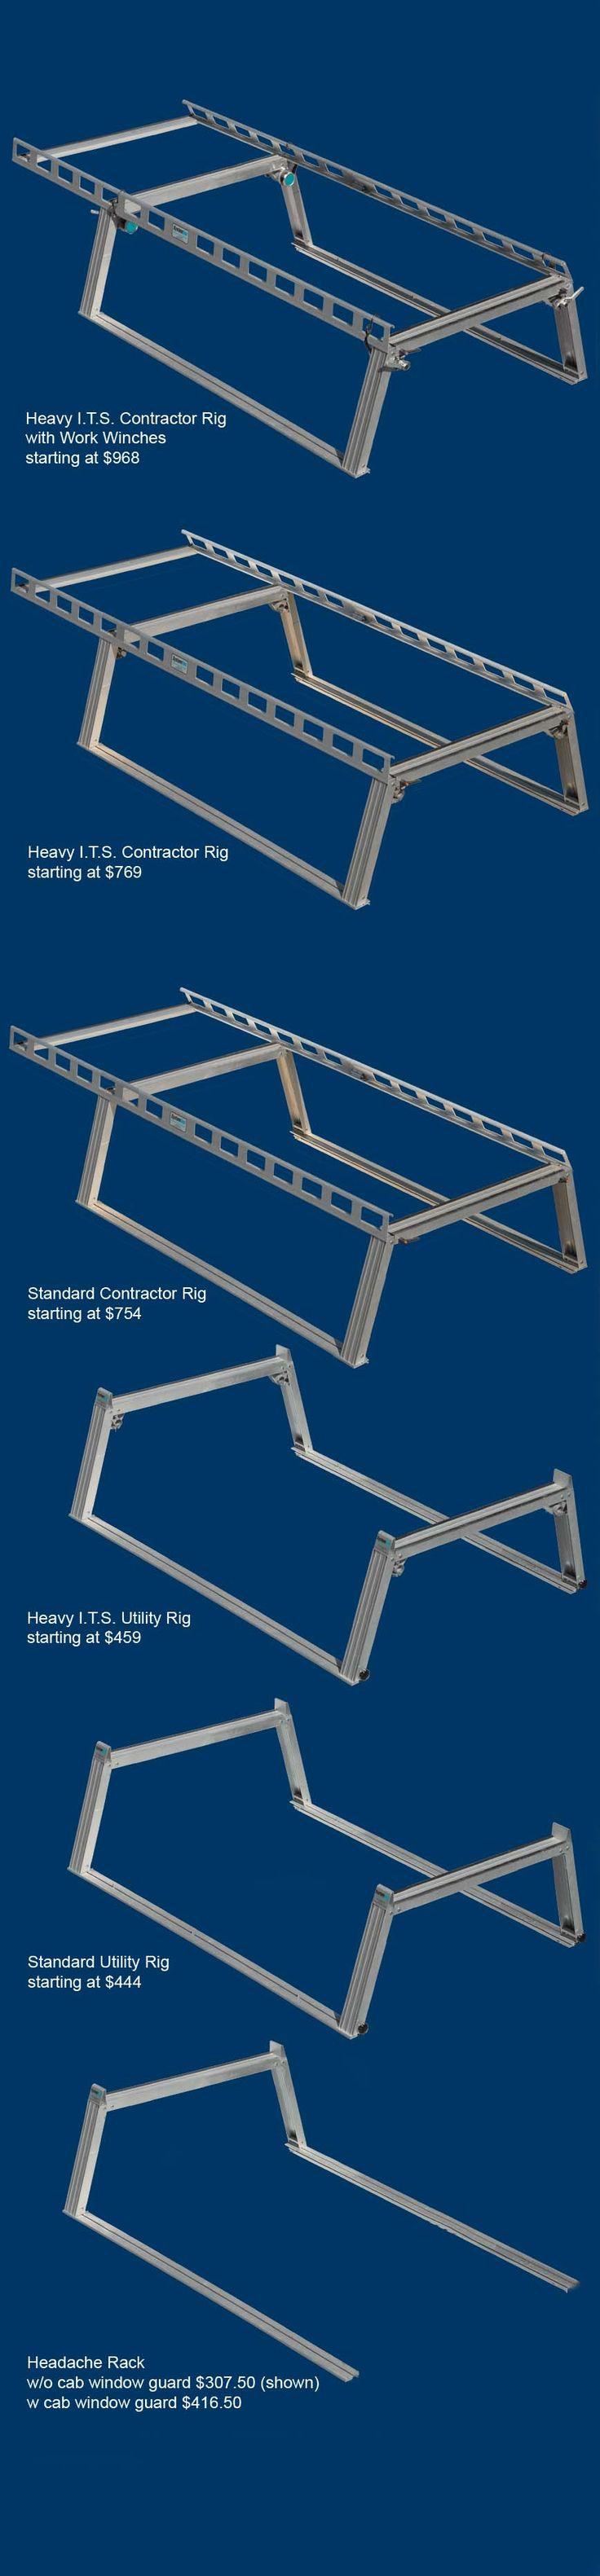 Service body utility body ladder racks truck racks overview